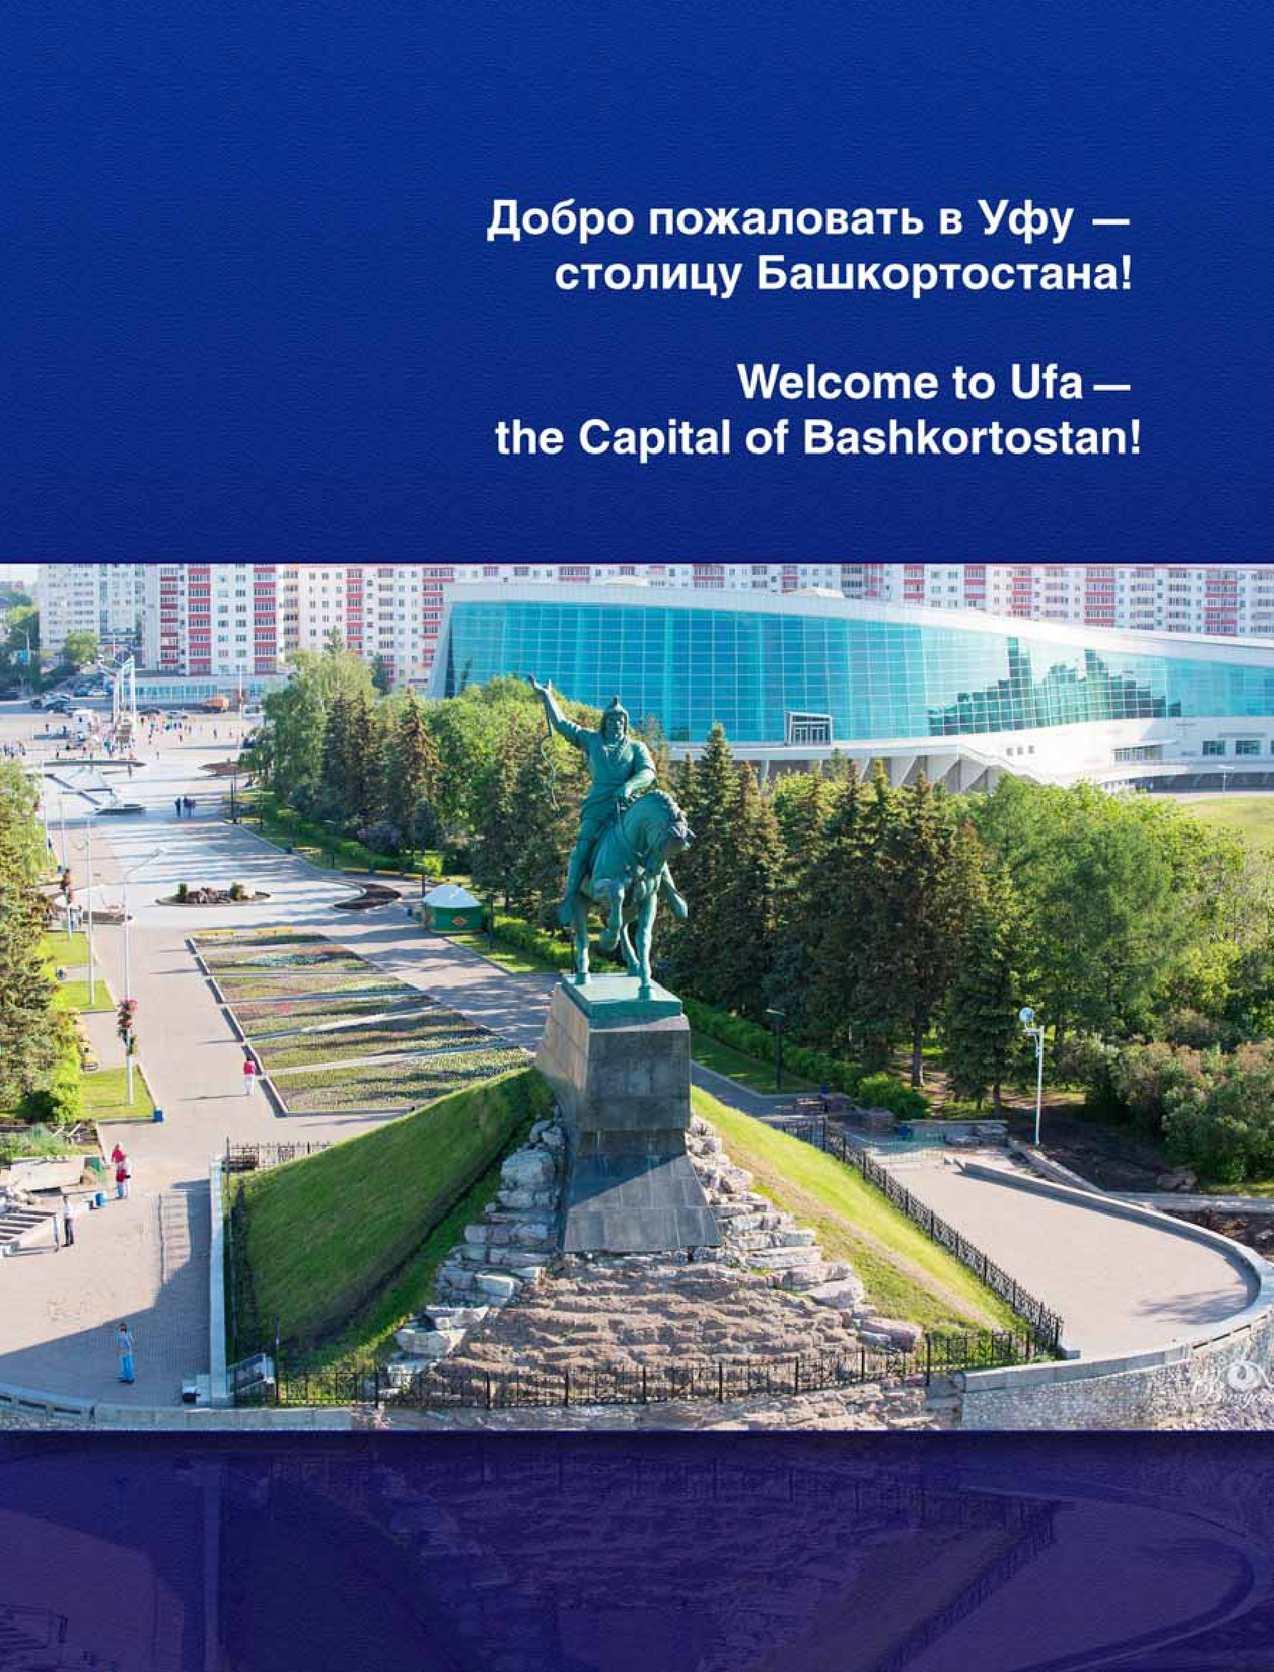 d34c98079 Calaméo - «Добро пожаловать в столицу Башкортостана» («Welcome to the  capital of Bashkortostan!»)